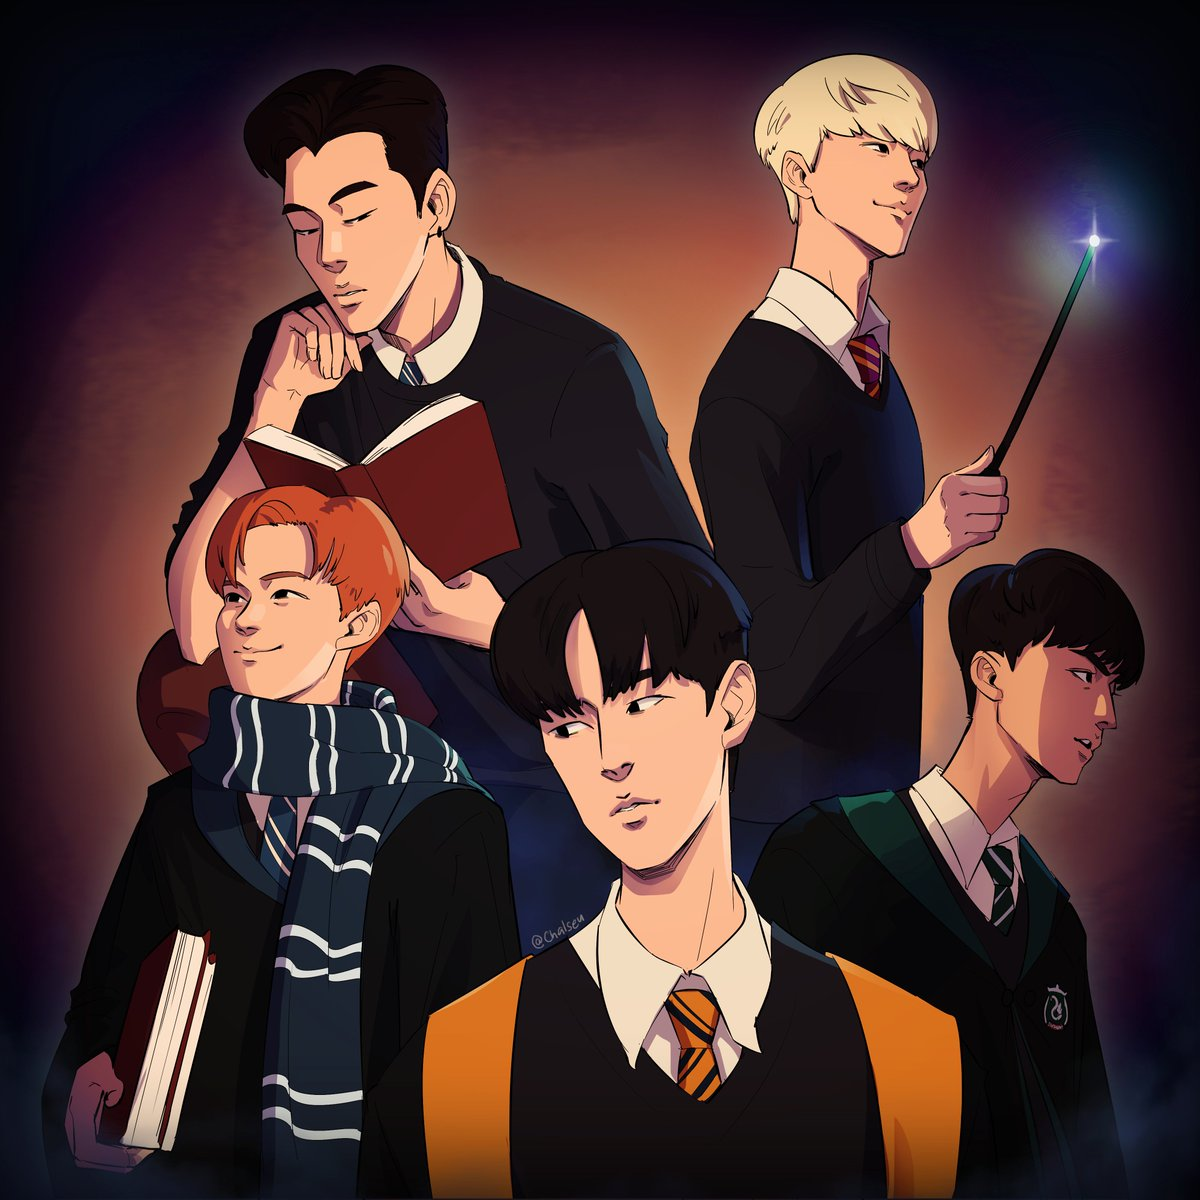 KNK as wizards attending Hogwarts. #chalseu #knk #knkfanart #heejun #seungjun #jihun #youjin #inseong<br>http://pic.twitter.com/TsnrWxGqtx